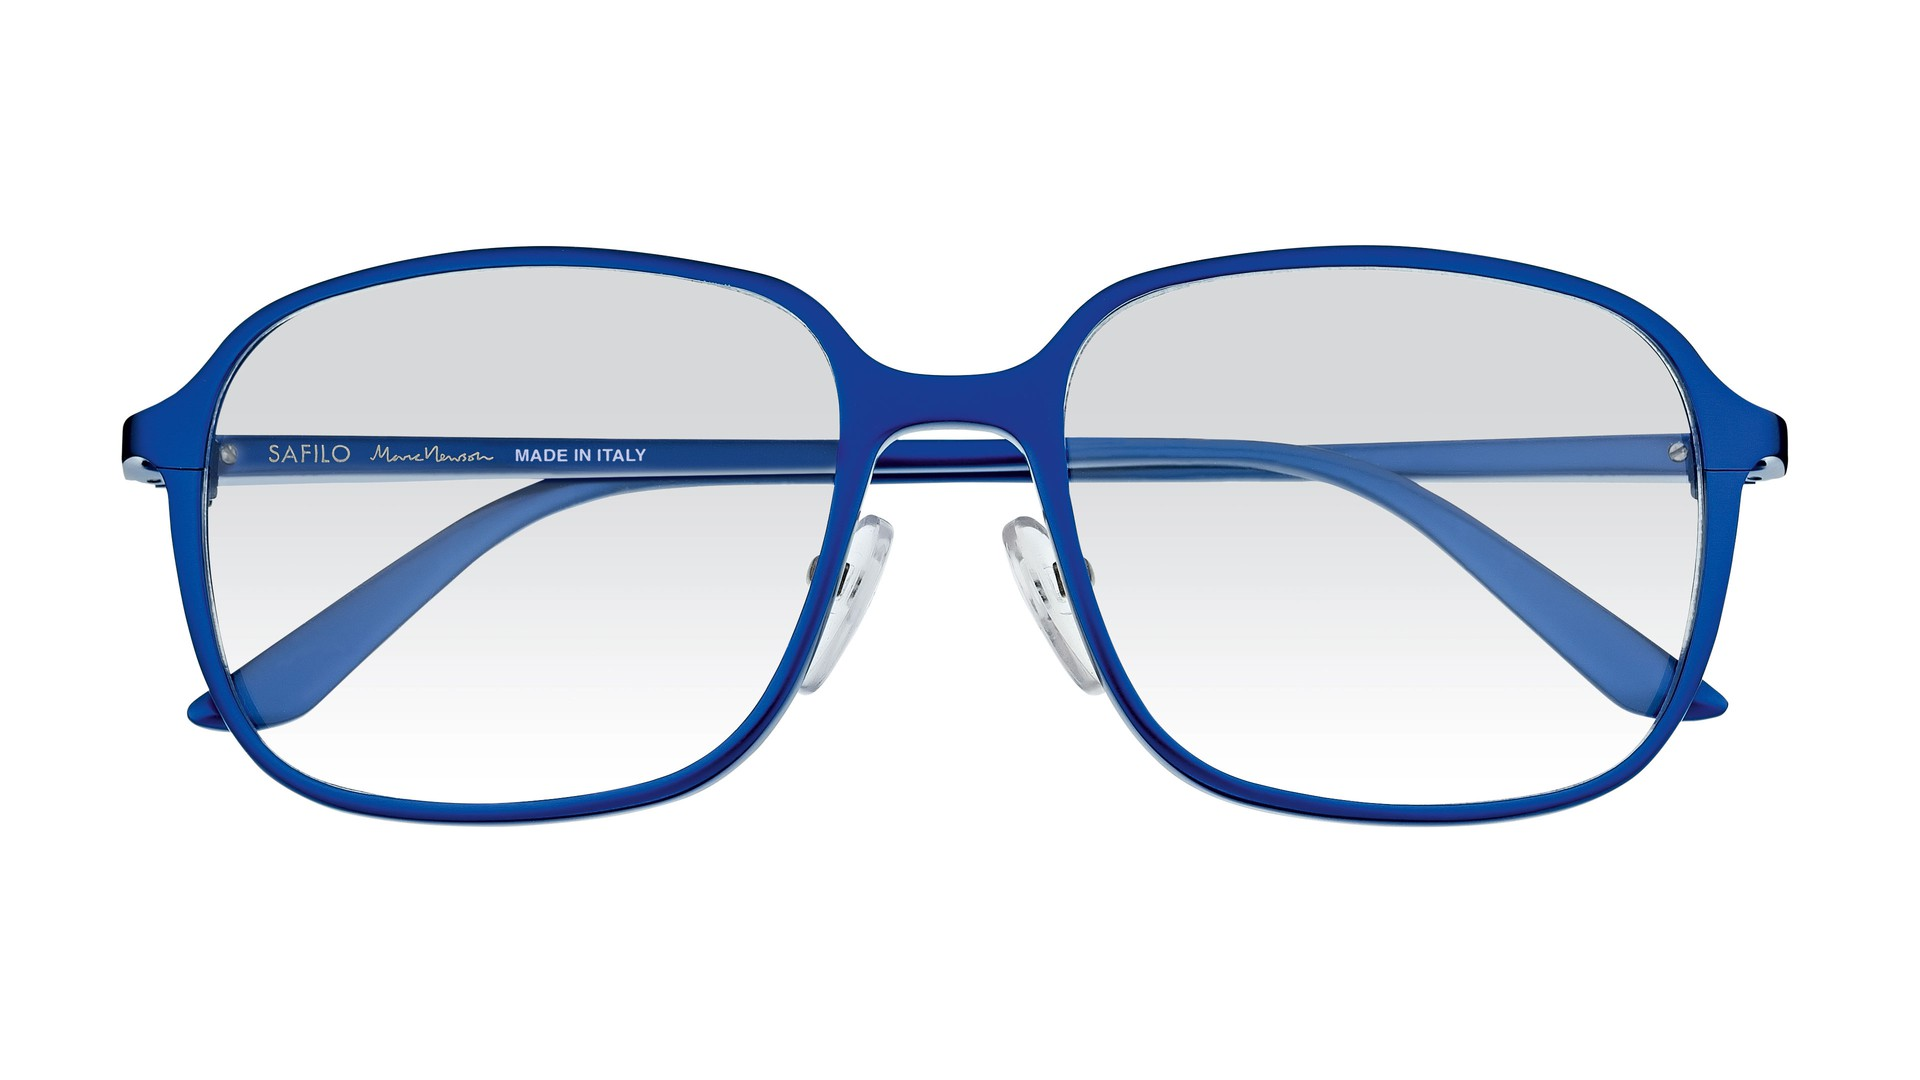 Capsule Eyewear Collection | Marc Newson Ltd